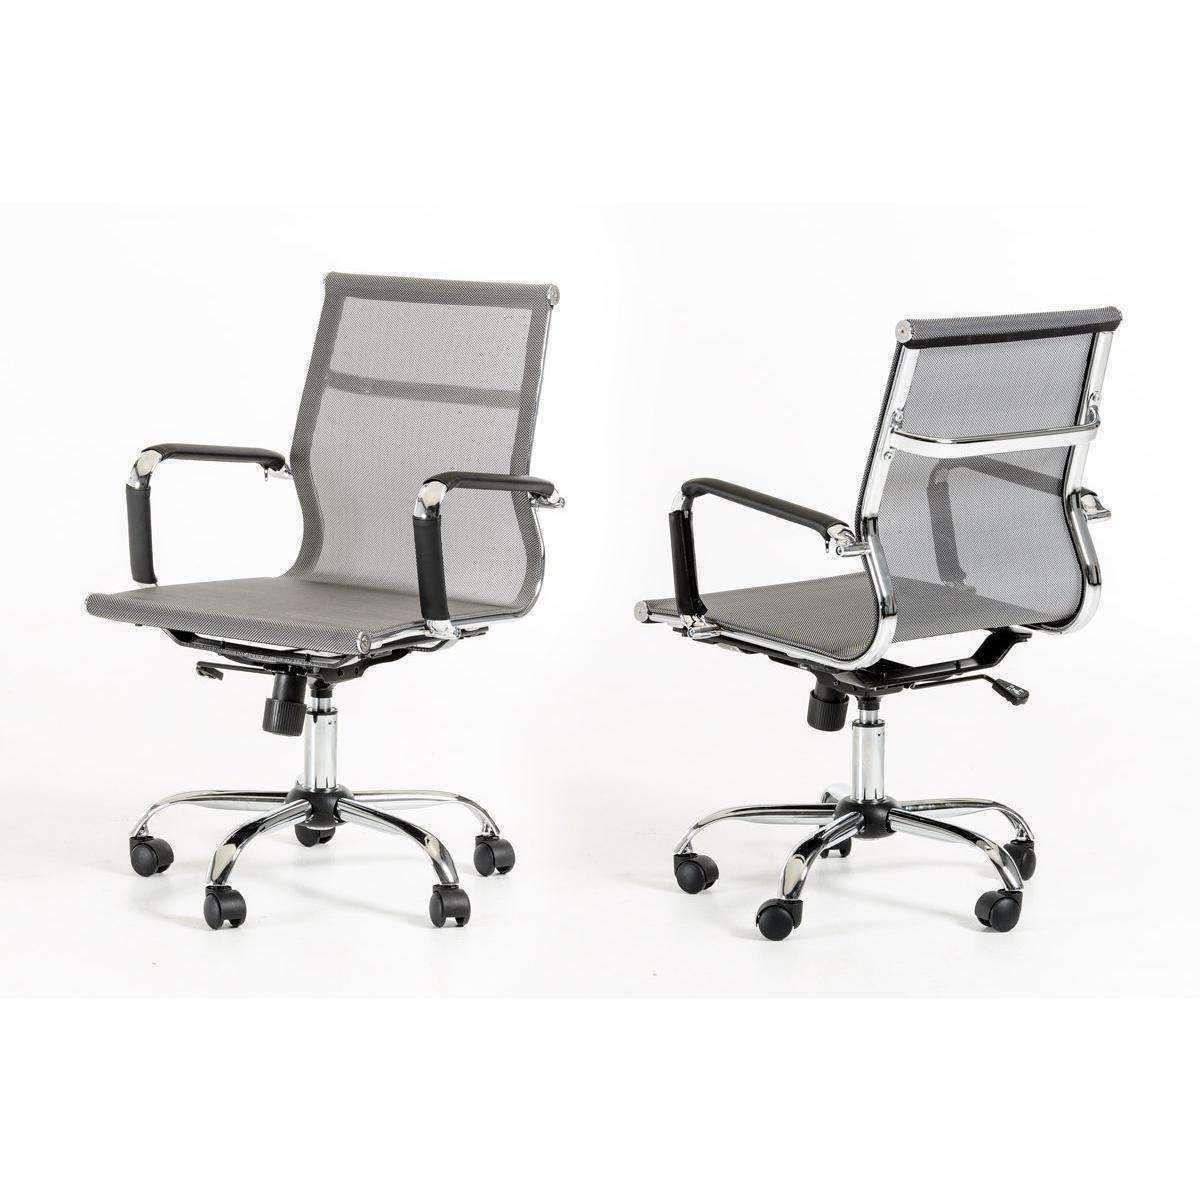 replica eames group standard aluminium chair cf. Herman Miller Aluminum Side Chair Collection | Office Pinterest Replica Eames Group Standard Aluminium Cf